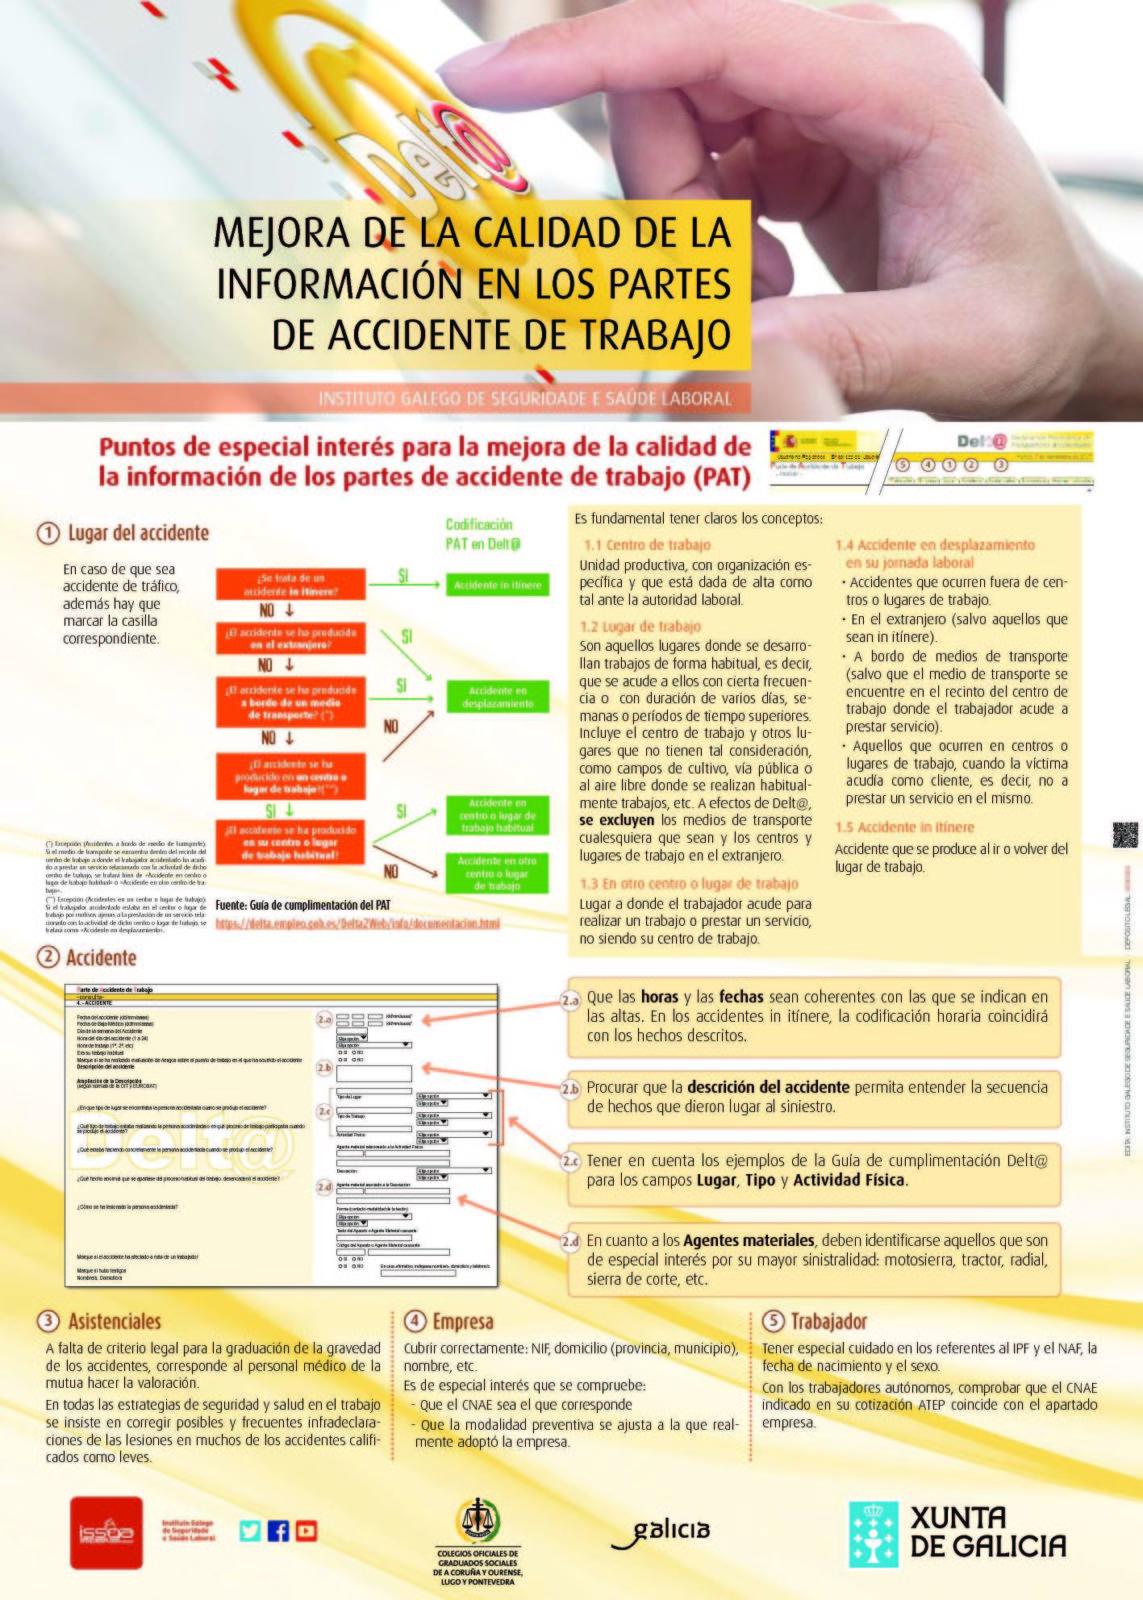 Issga17 PartesTrabCartelV3 Cas.pdf